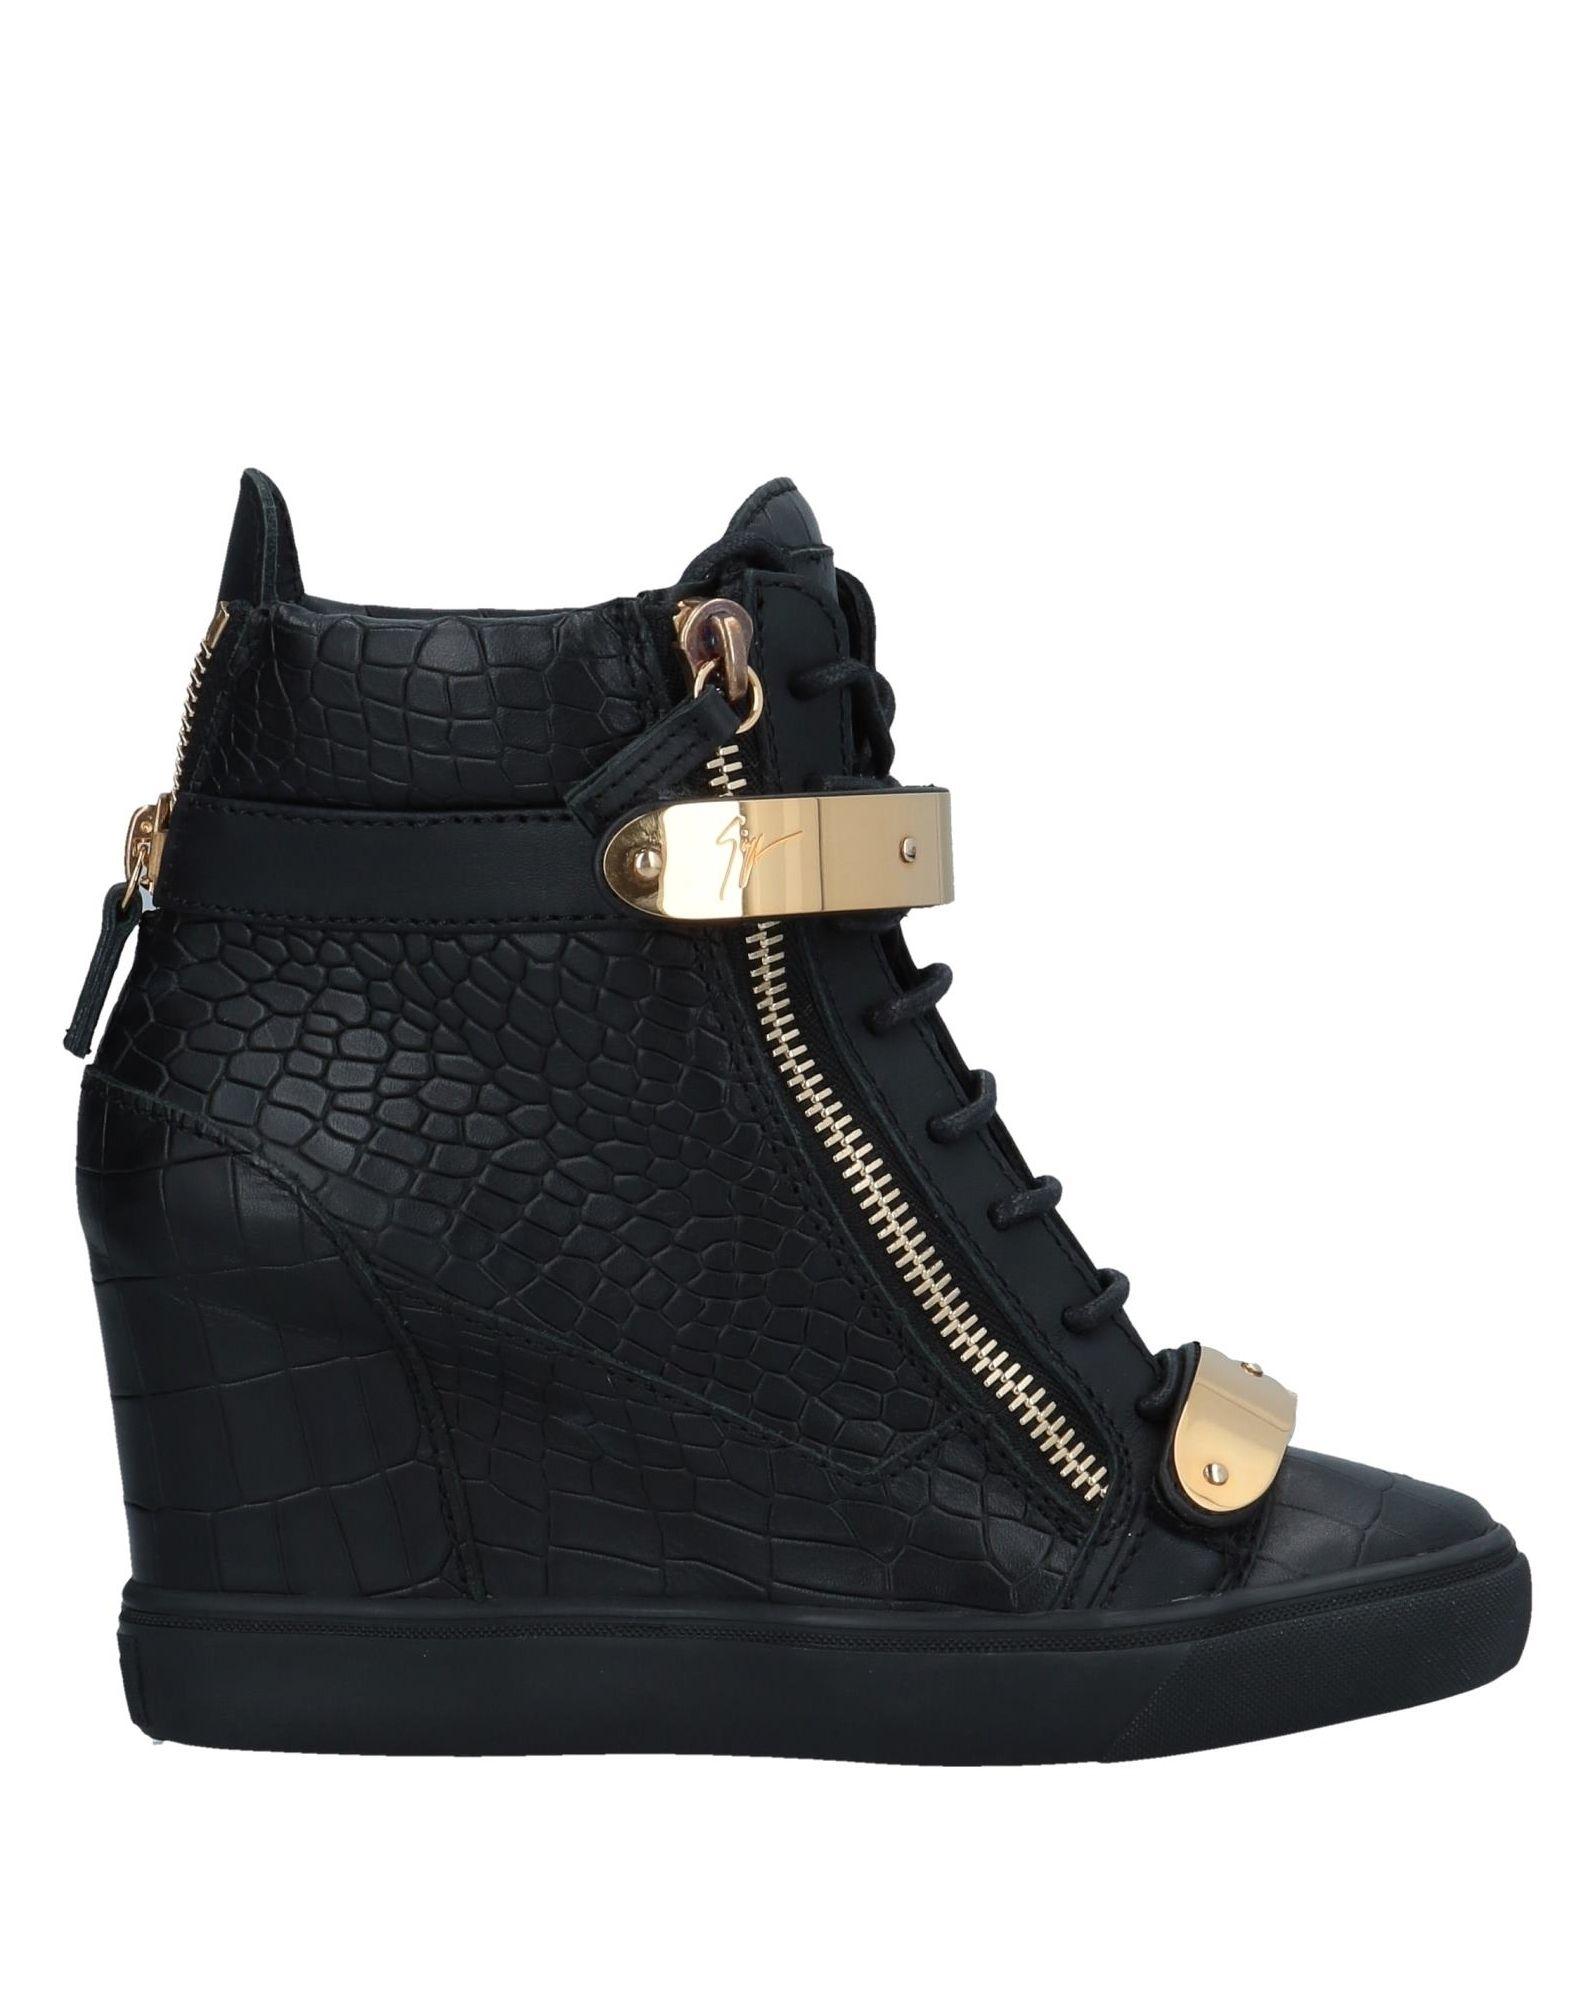 Giuseppe Zanotti Zanotti Sneakers - Women Giuseppe Zanotti Zanotti Sneakers online on  United Kingdom - 11554197KT 80187e